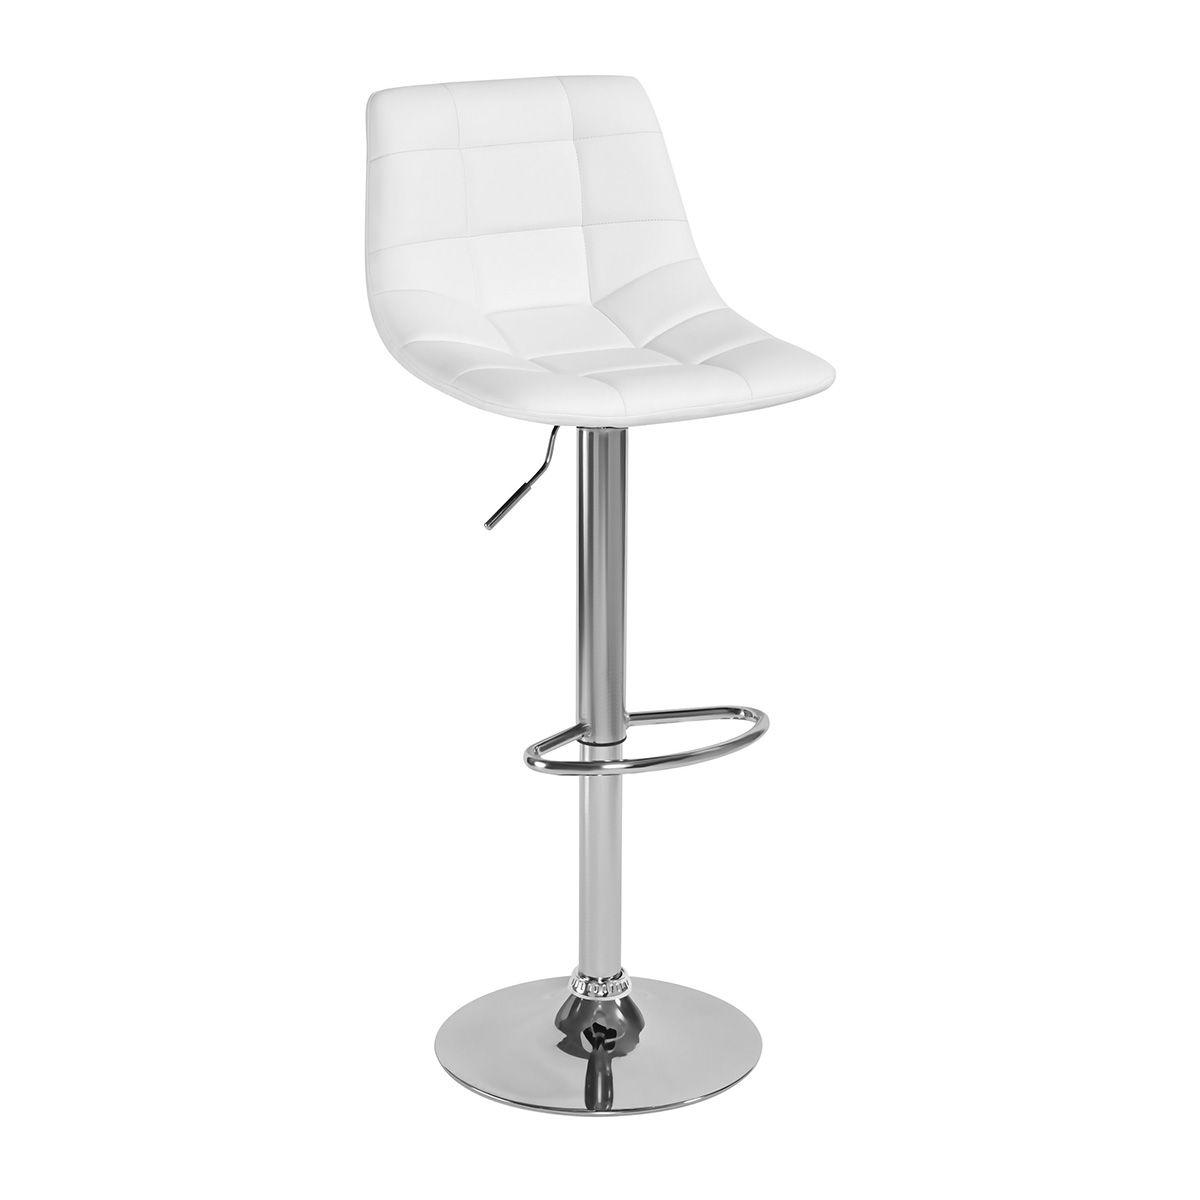 Барный стул Chianti белыйБарные стулья<br><br>